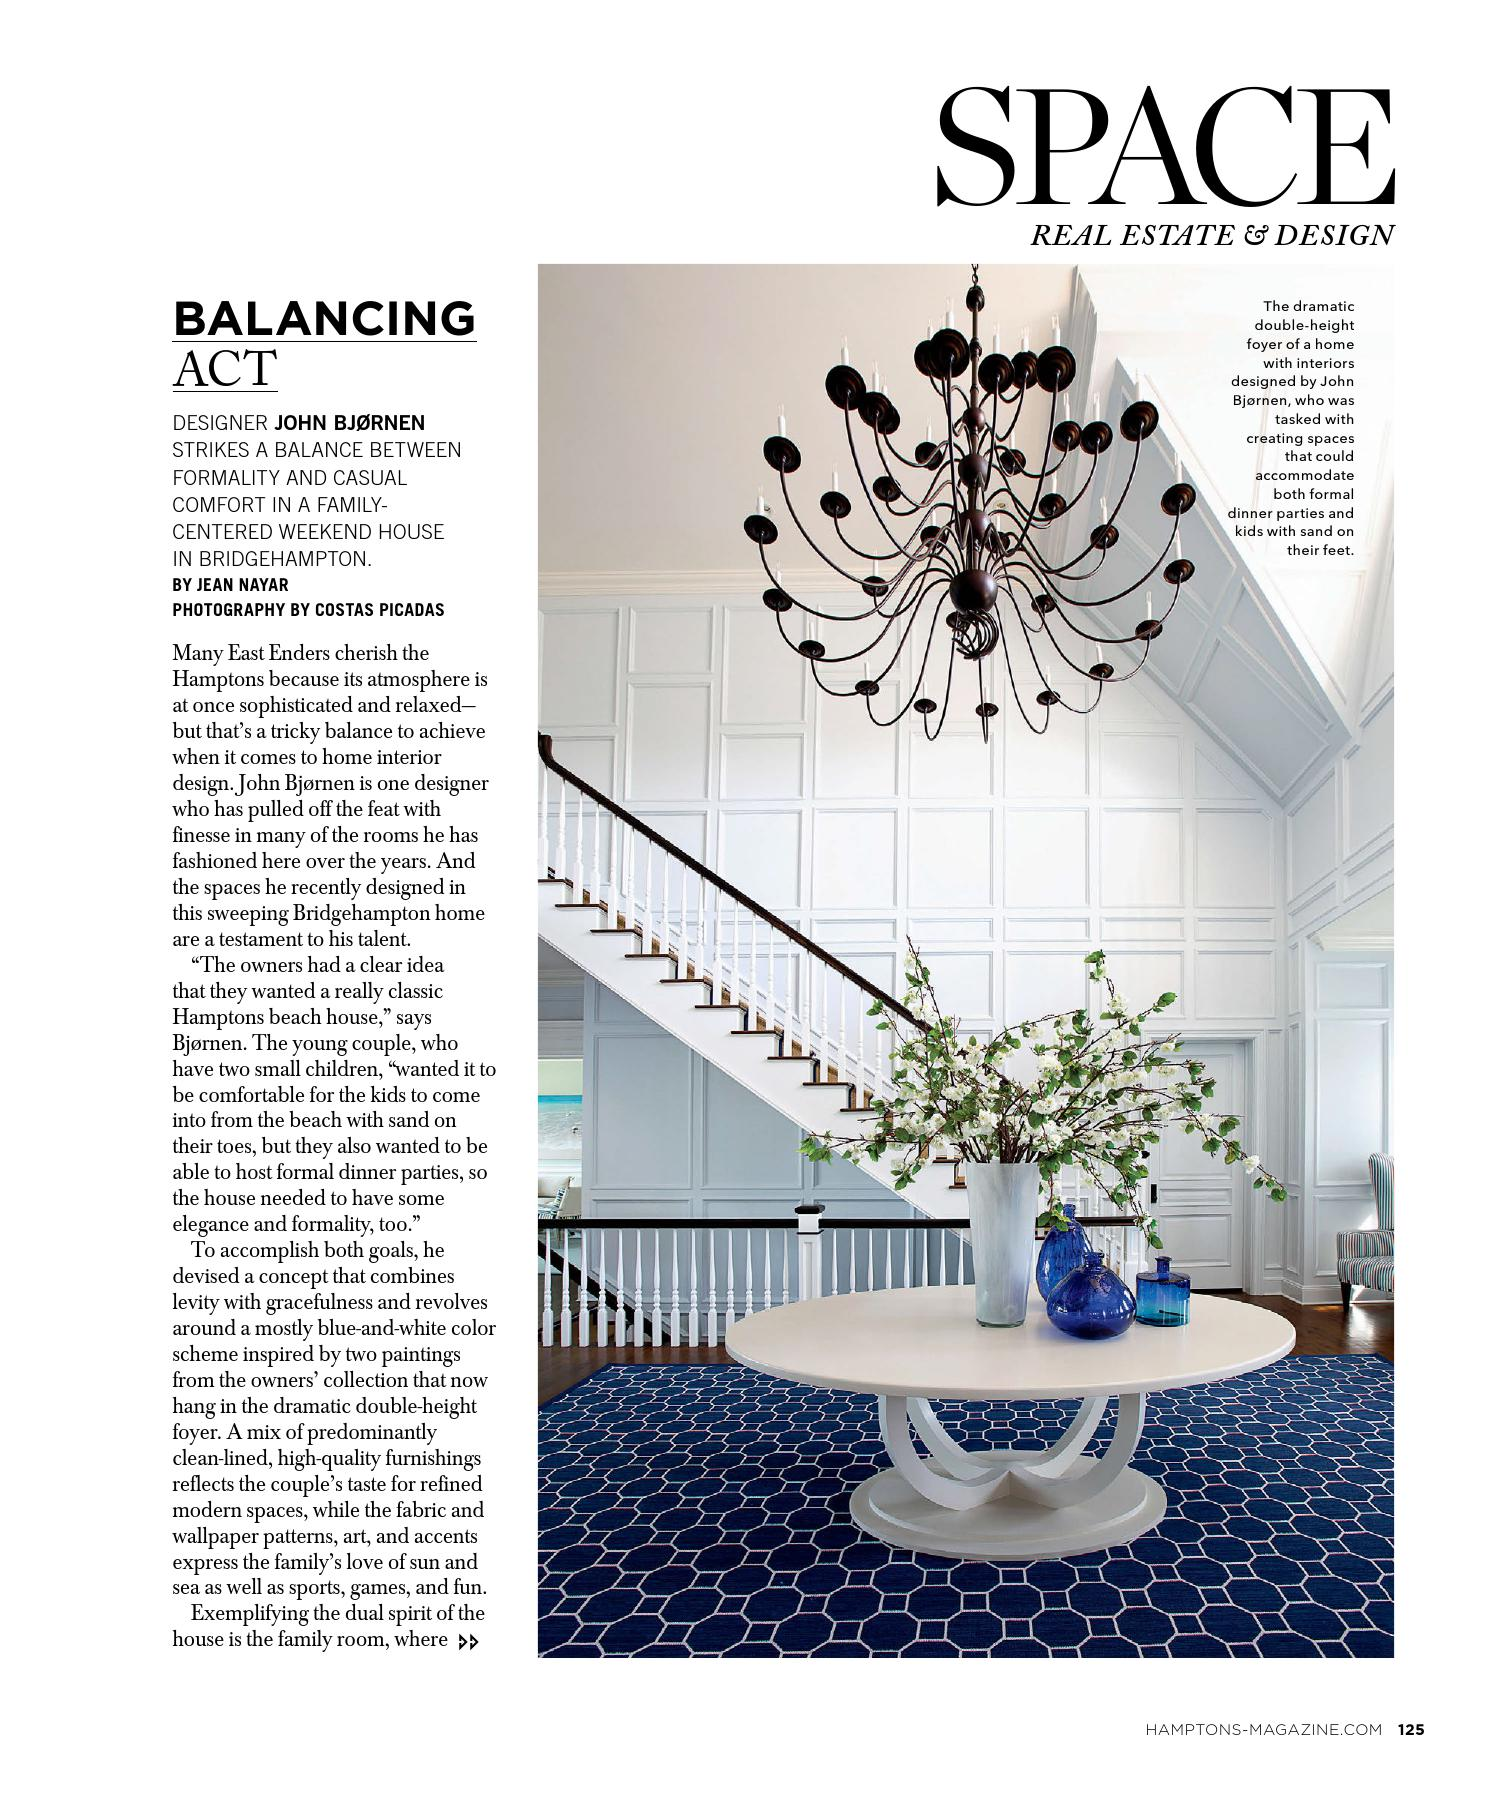 Hamptons  2016  Issue 8  Home  Garden  Hannah Ferguson_selected-pages_000001.jpg